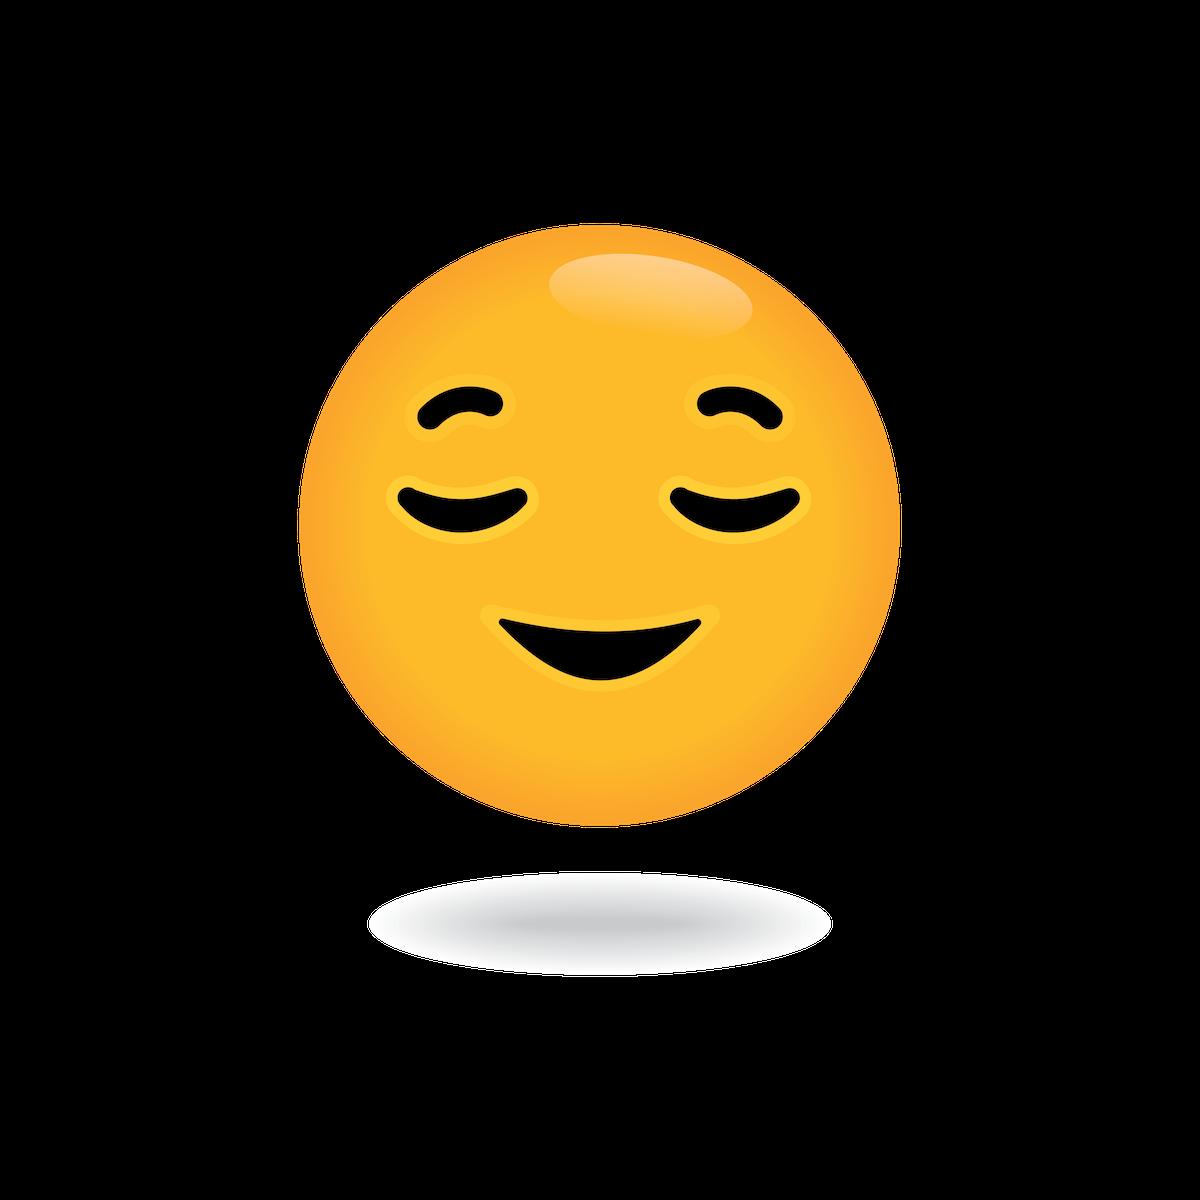 relax emoji by define awesome